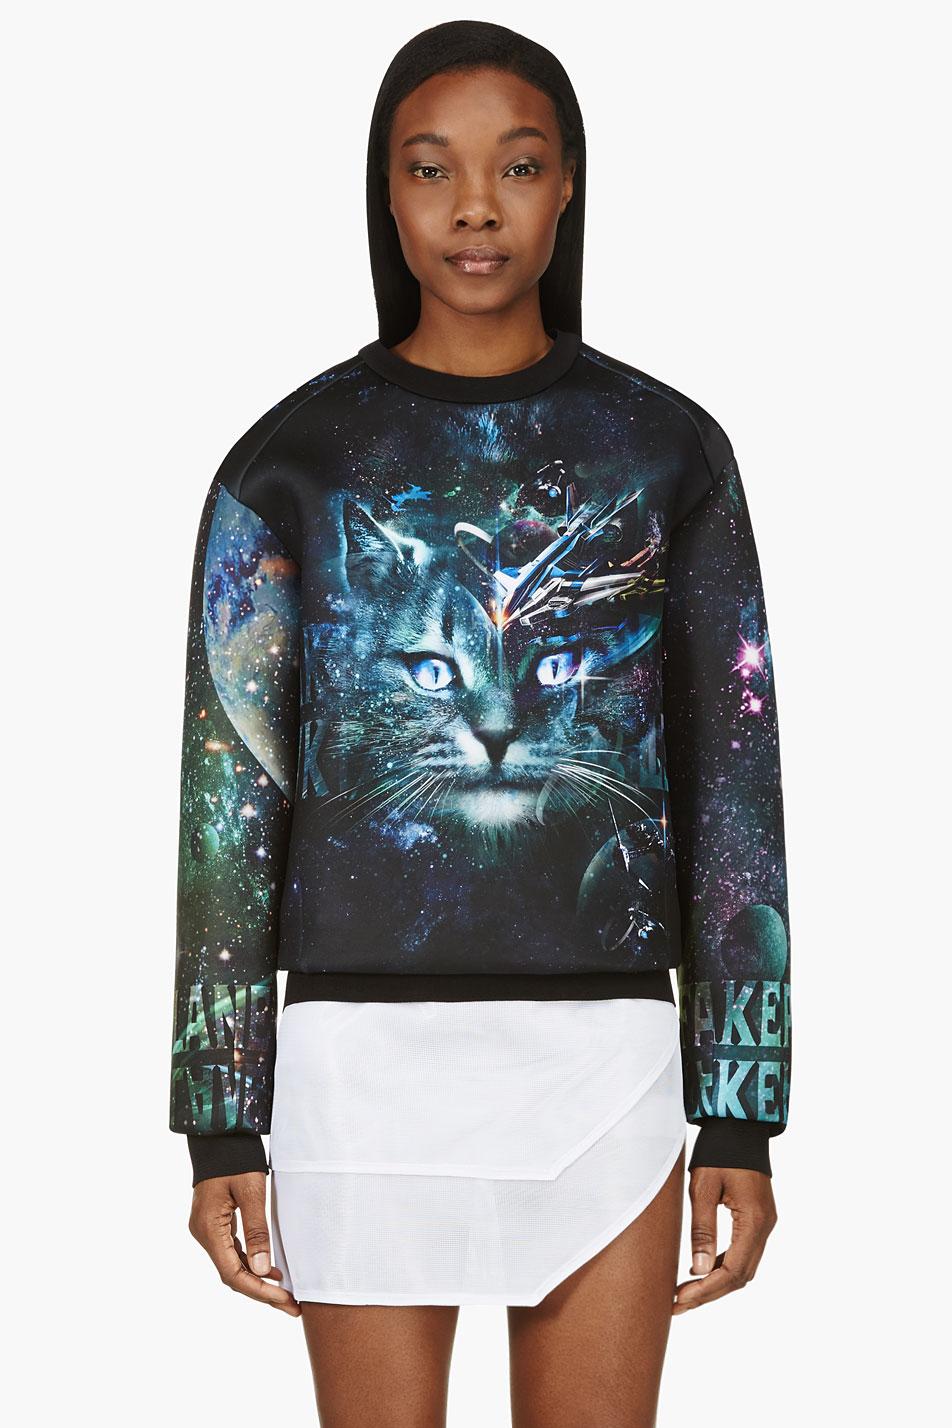 juun.j ssense exclusive black and teal cosmic cat sweatshirt